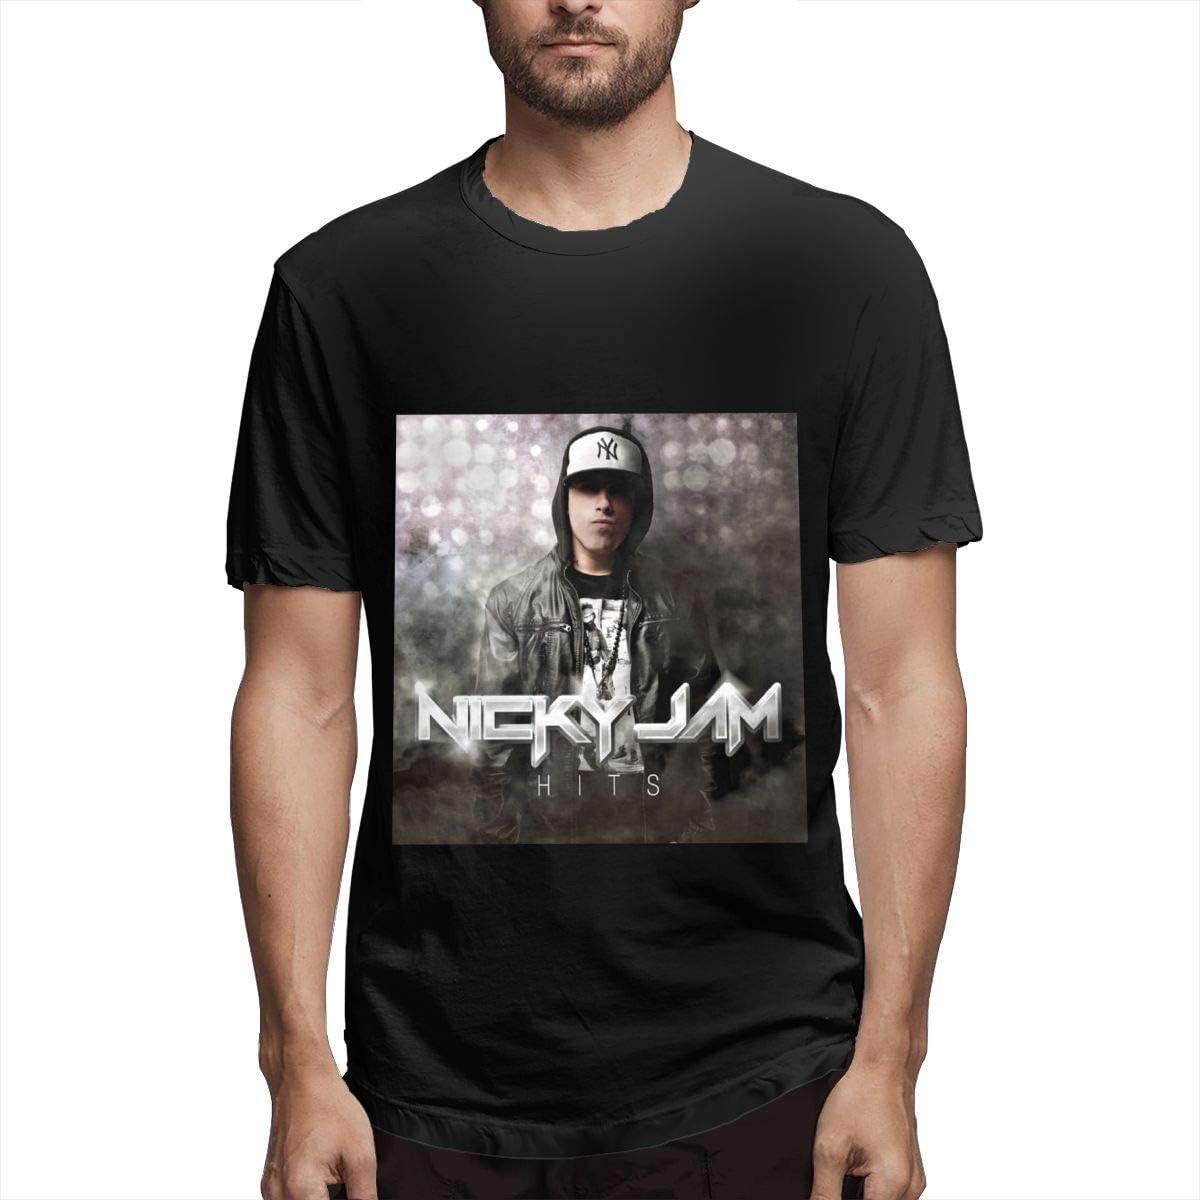 fghjfgdjhfd Camiseta de Manga Corta para Hombre,Nicky Jam ...